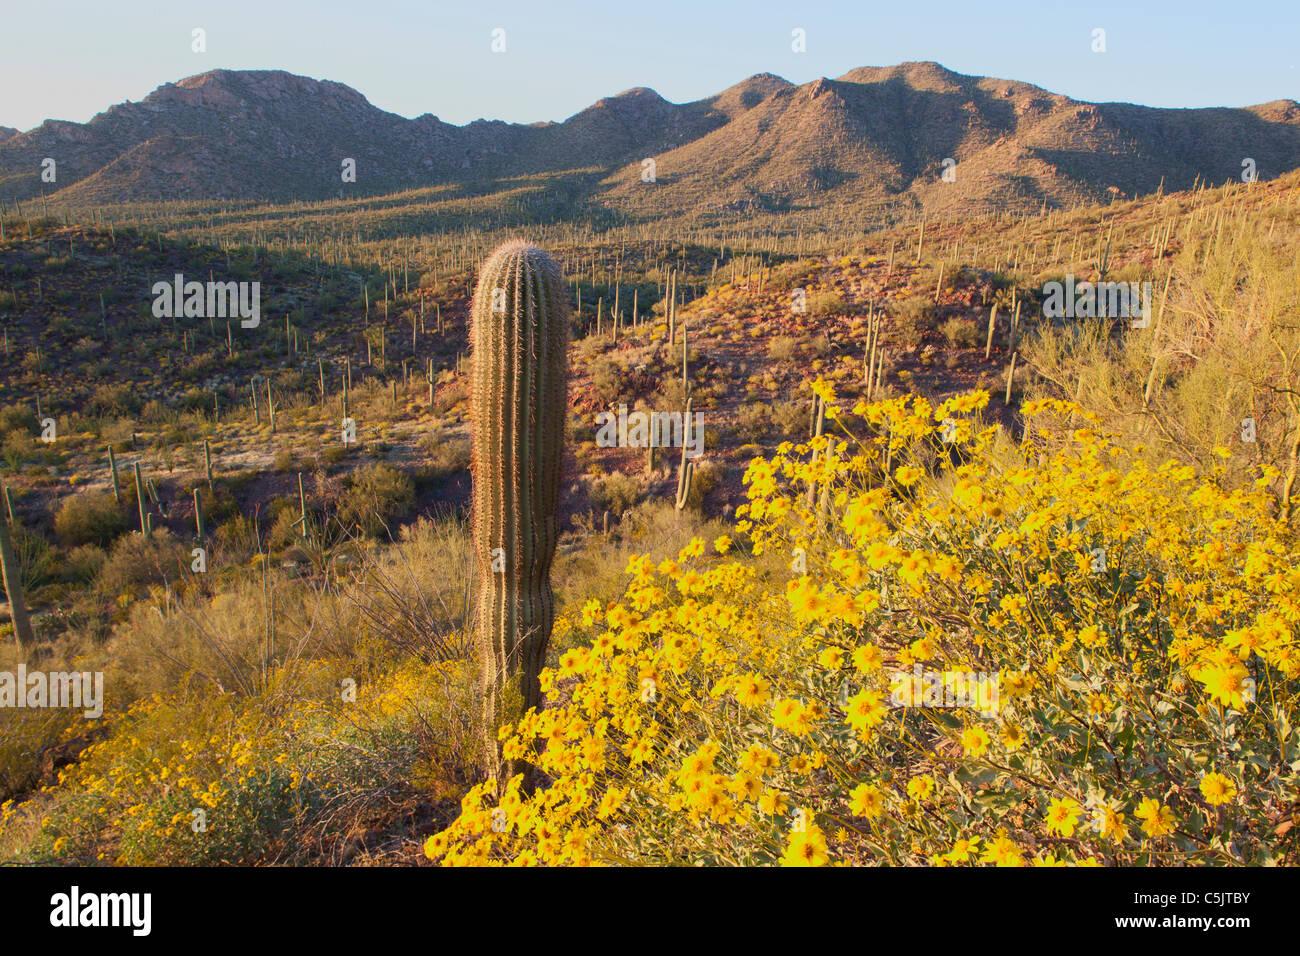 Cactus and wildflowers including brittlebush, in Saguaro West, Saguaro National Park, Tucson, Arizona. - Stock Image